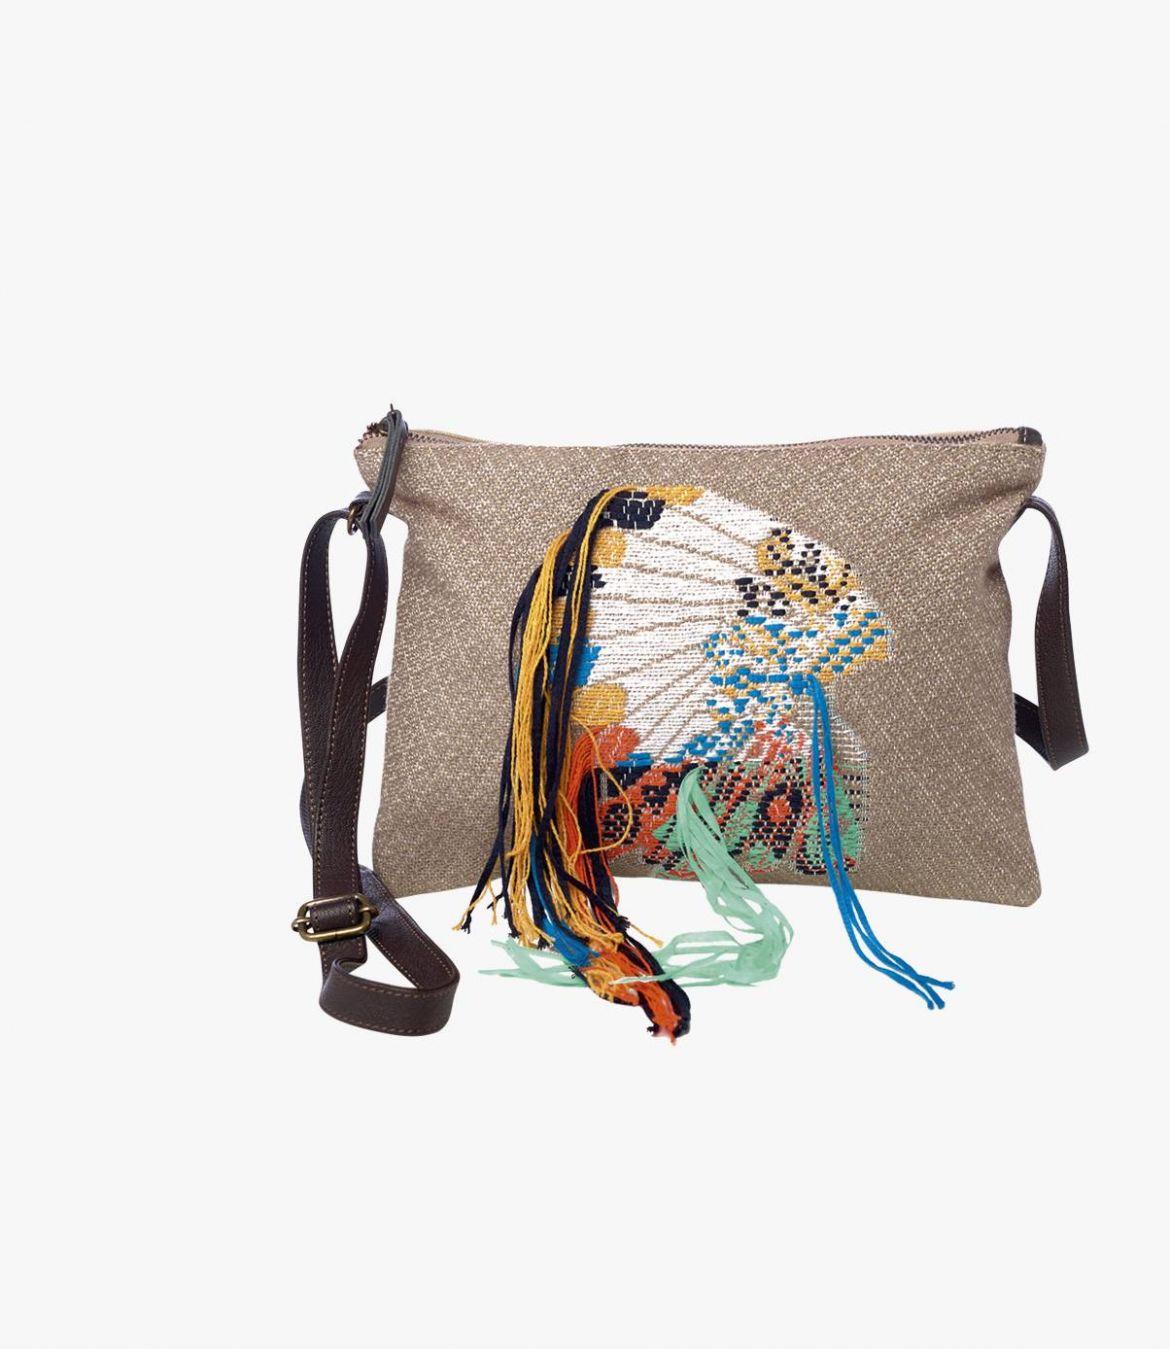 SUZY CHEF Polyester Pocket, Polyamide, Cotton, Women's Leather 20 x 28 cm Storiatipic - 1